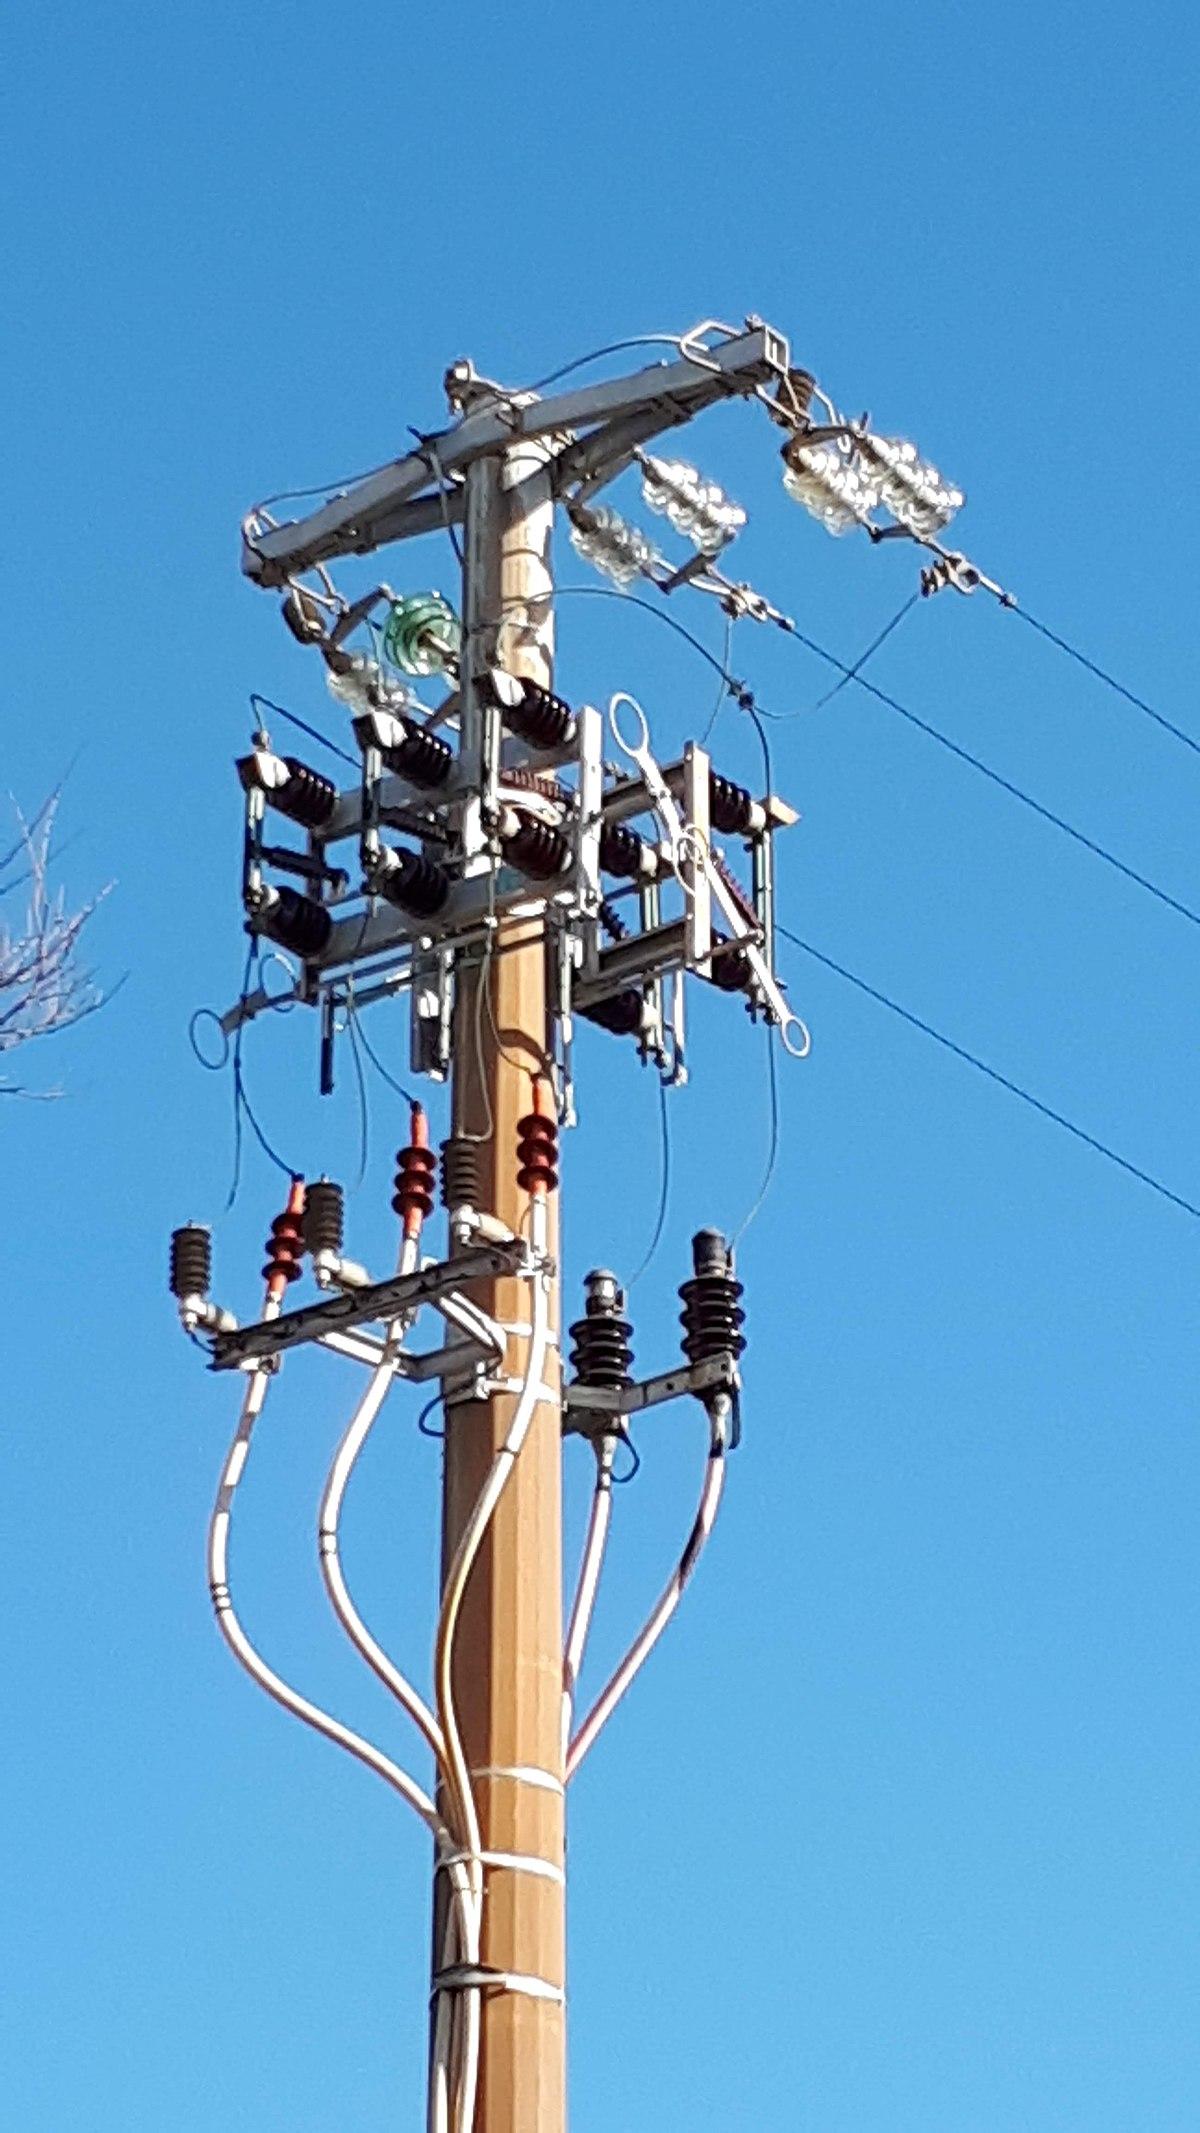 Distribuzione di energia elettrica - Wikipedia